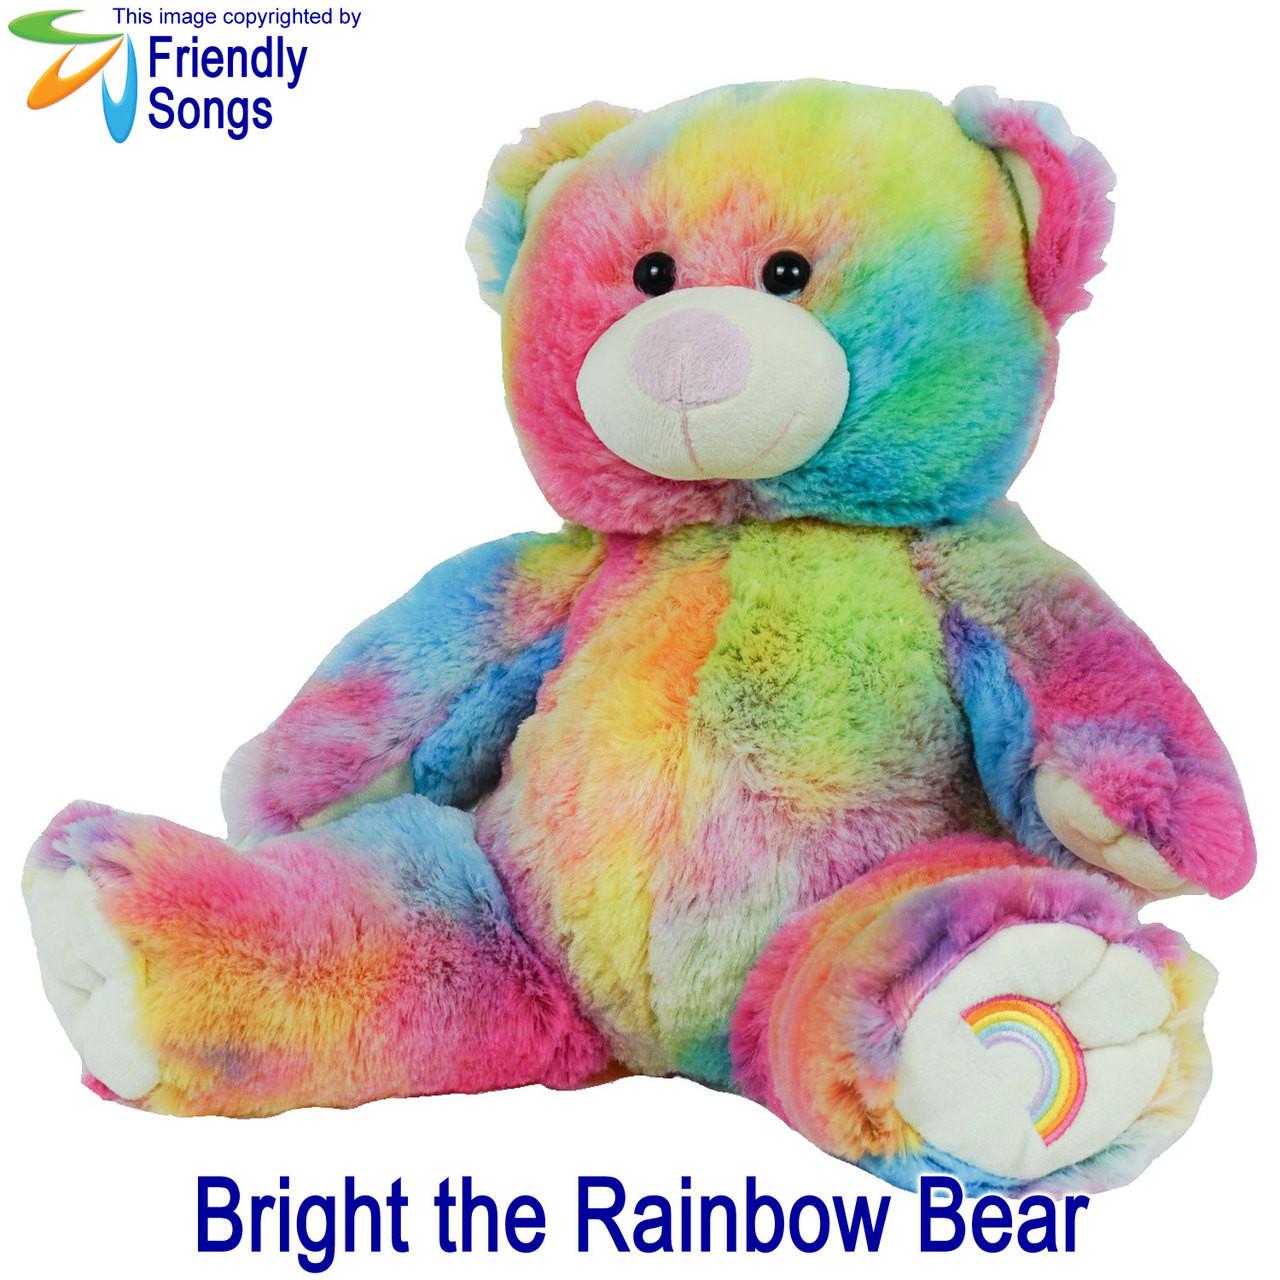 Bright the Rainbow Bear Personalized Stuffed Animal